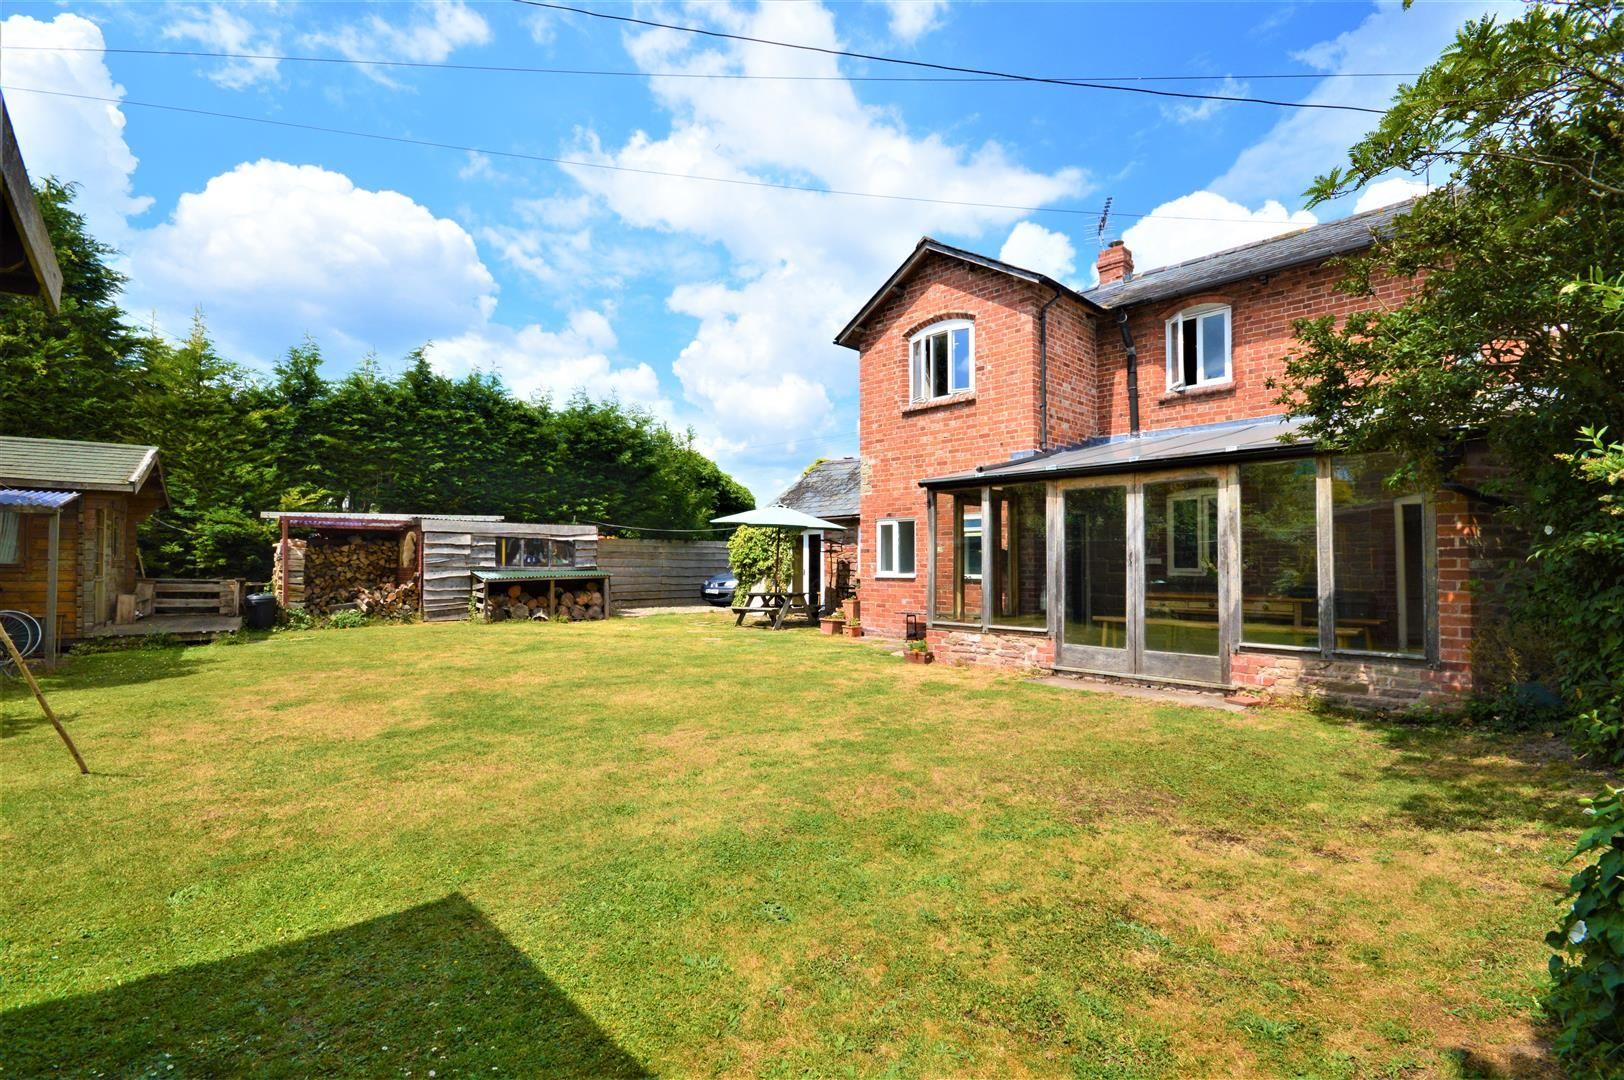 3 bed cottage for sale in Cross Keys  - Property Image 4